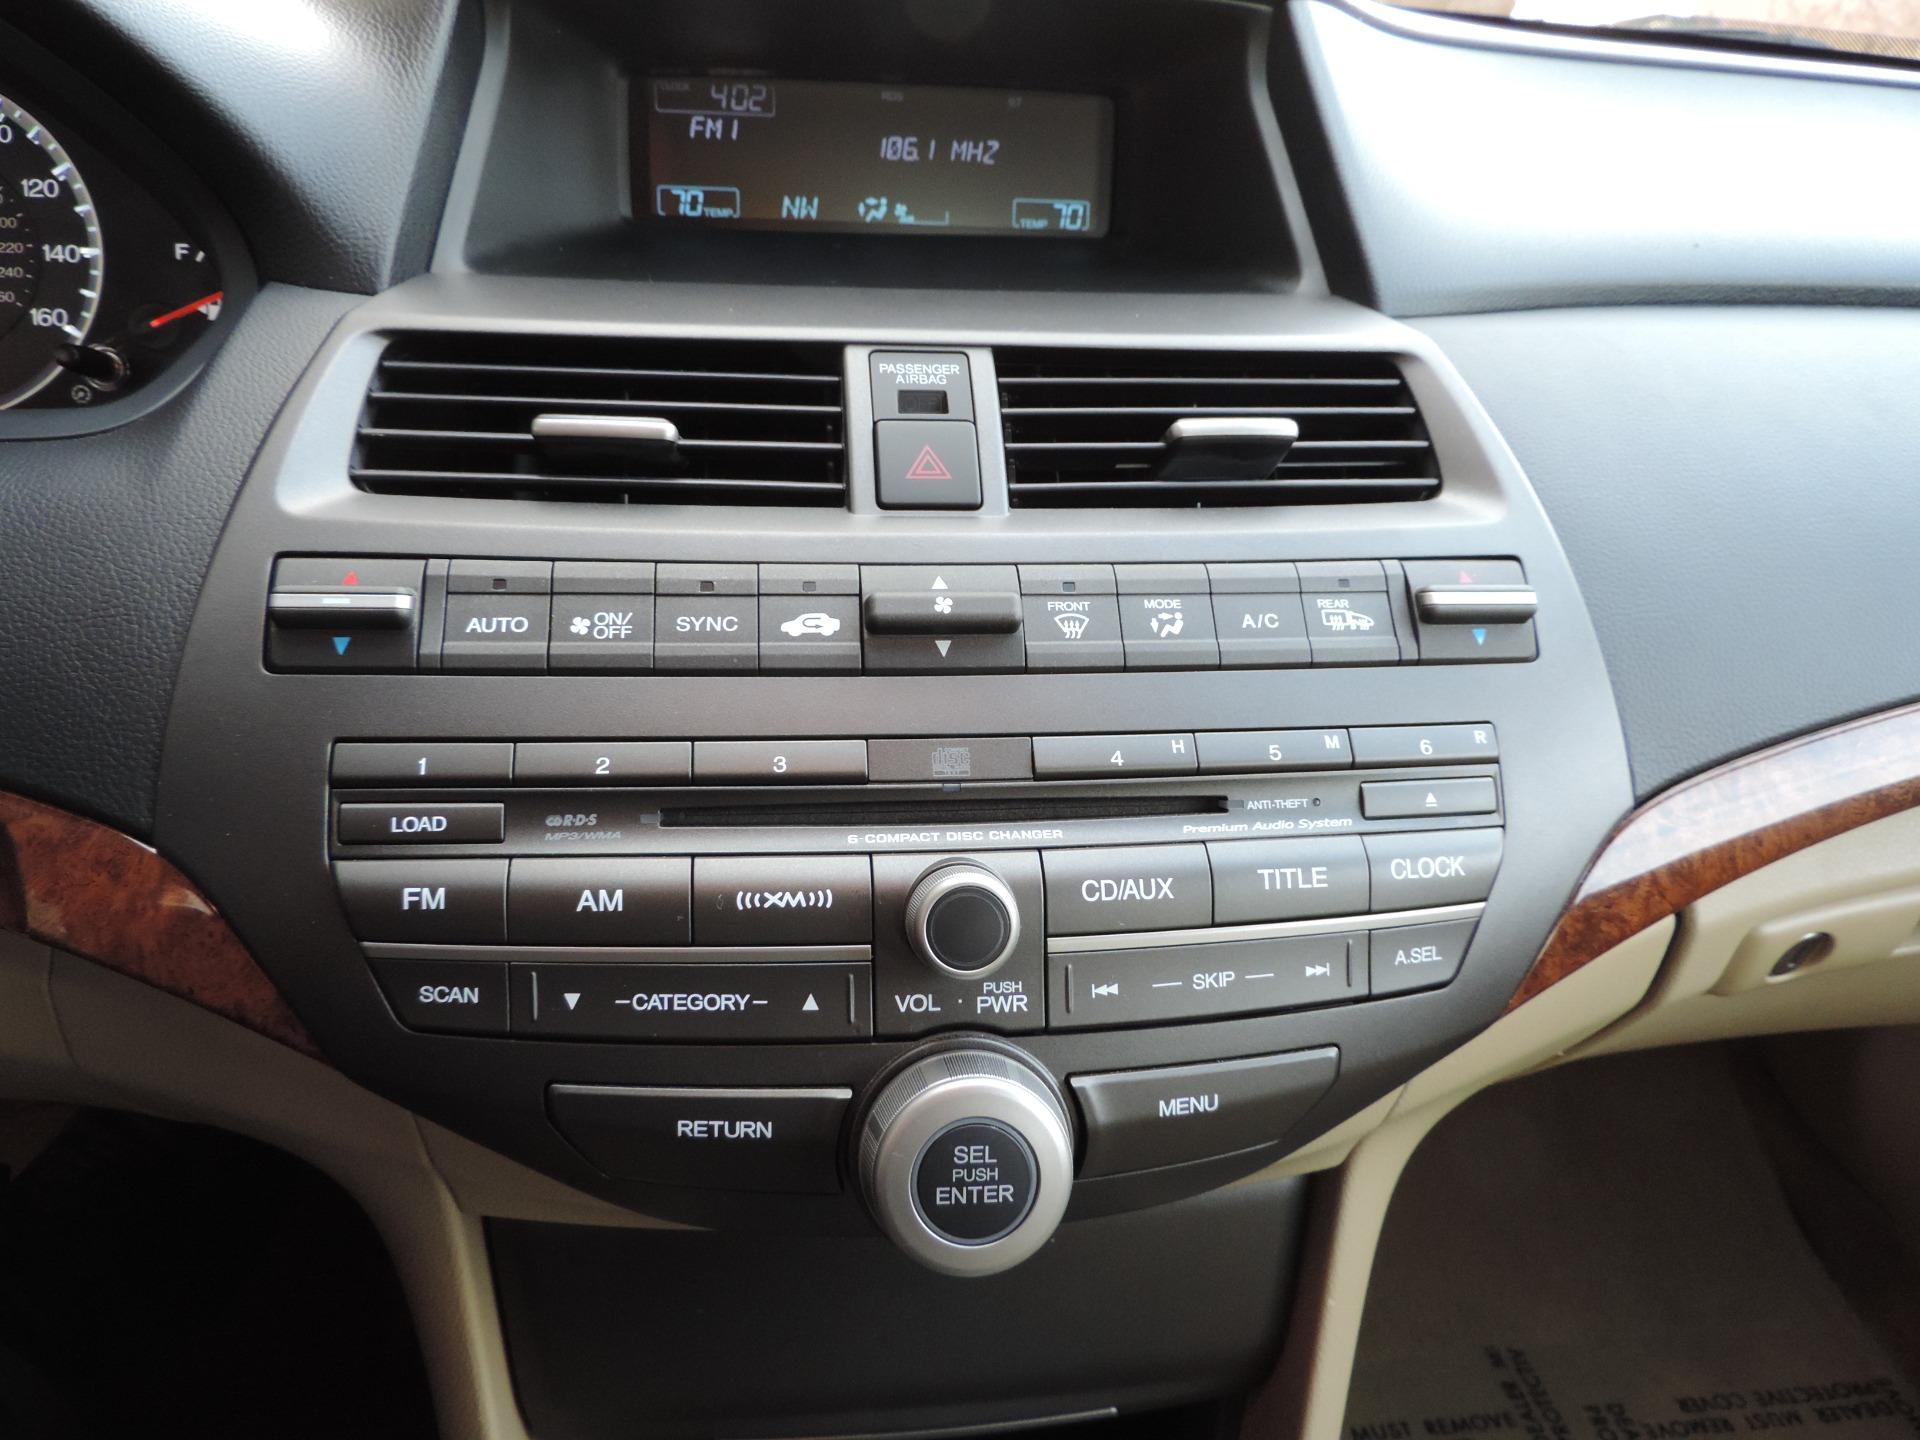 Used 2012 Honda Accord EX L V6